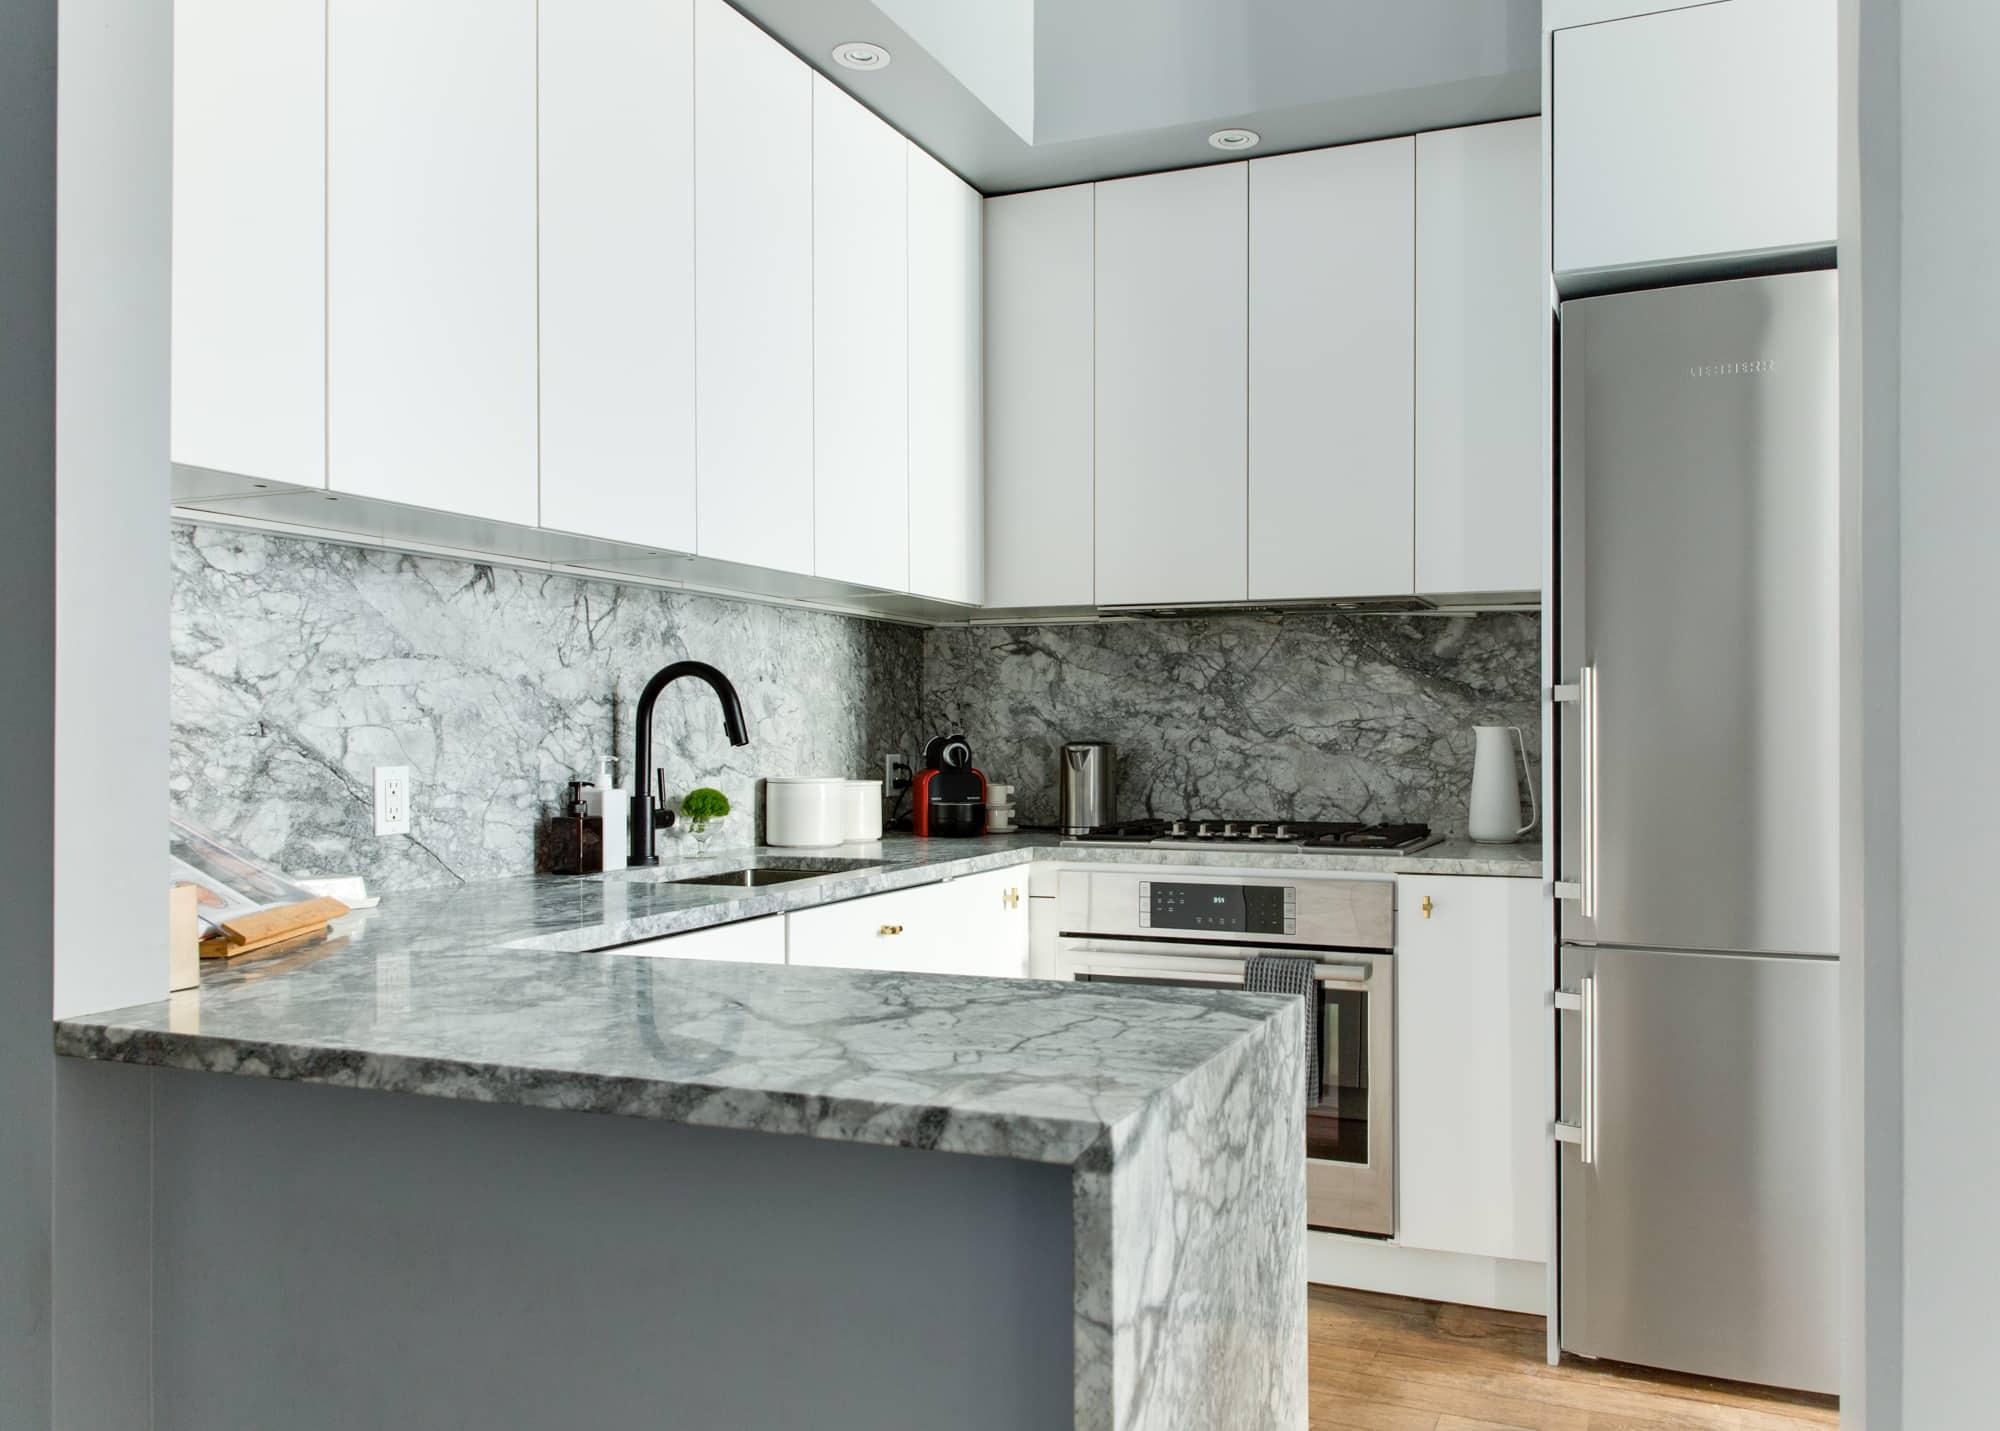 Peachy Kitchen Backsplash Tile Ideas Pictures Designs Home Interior And Landscaping Eliaenasavecom